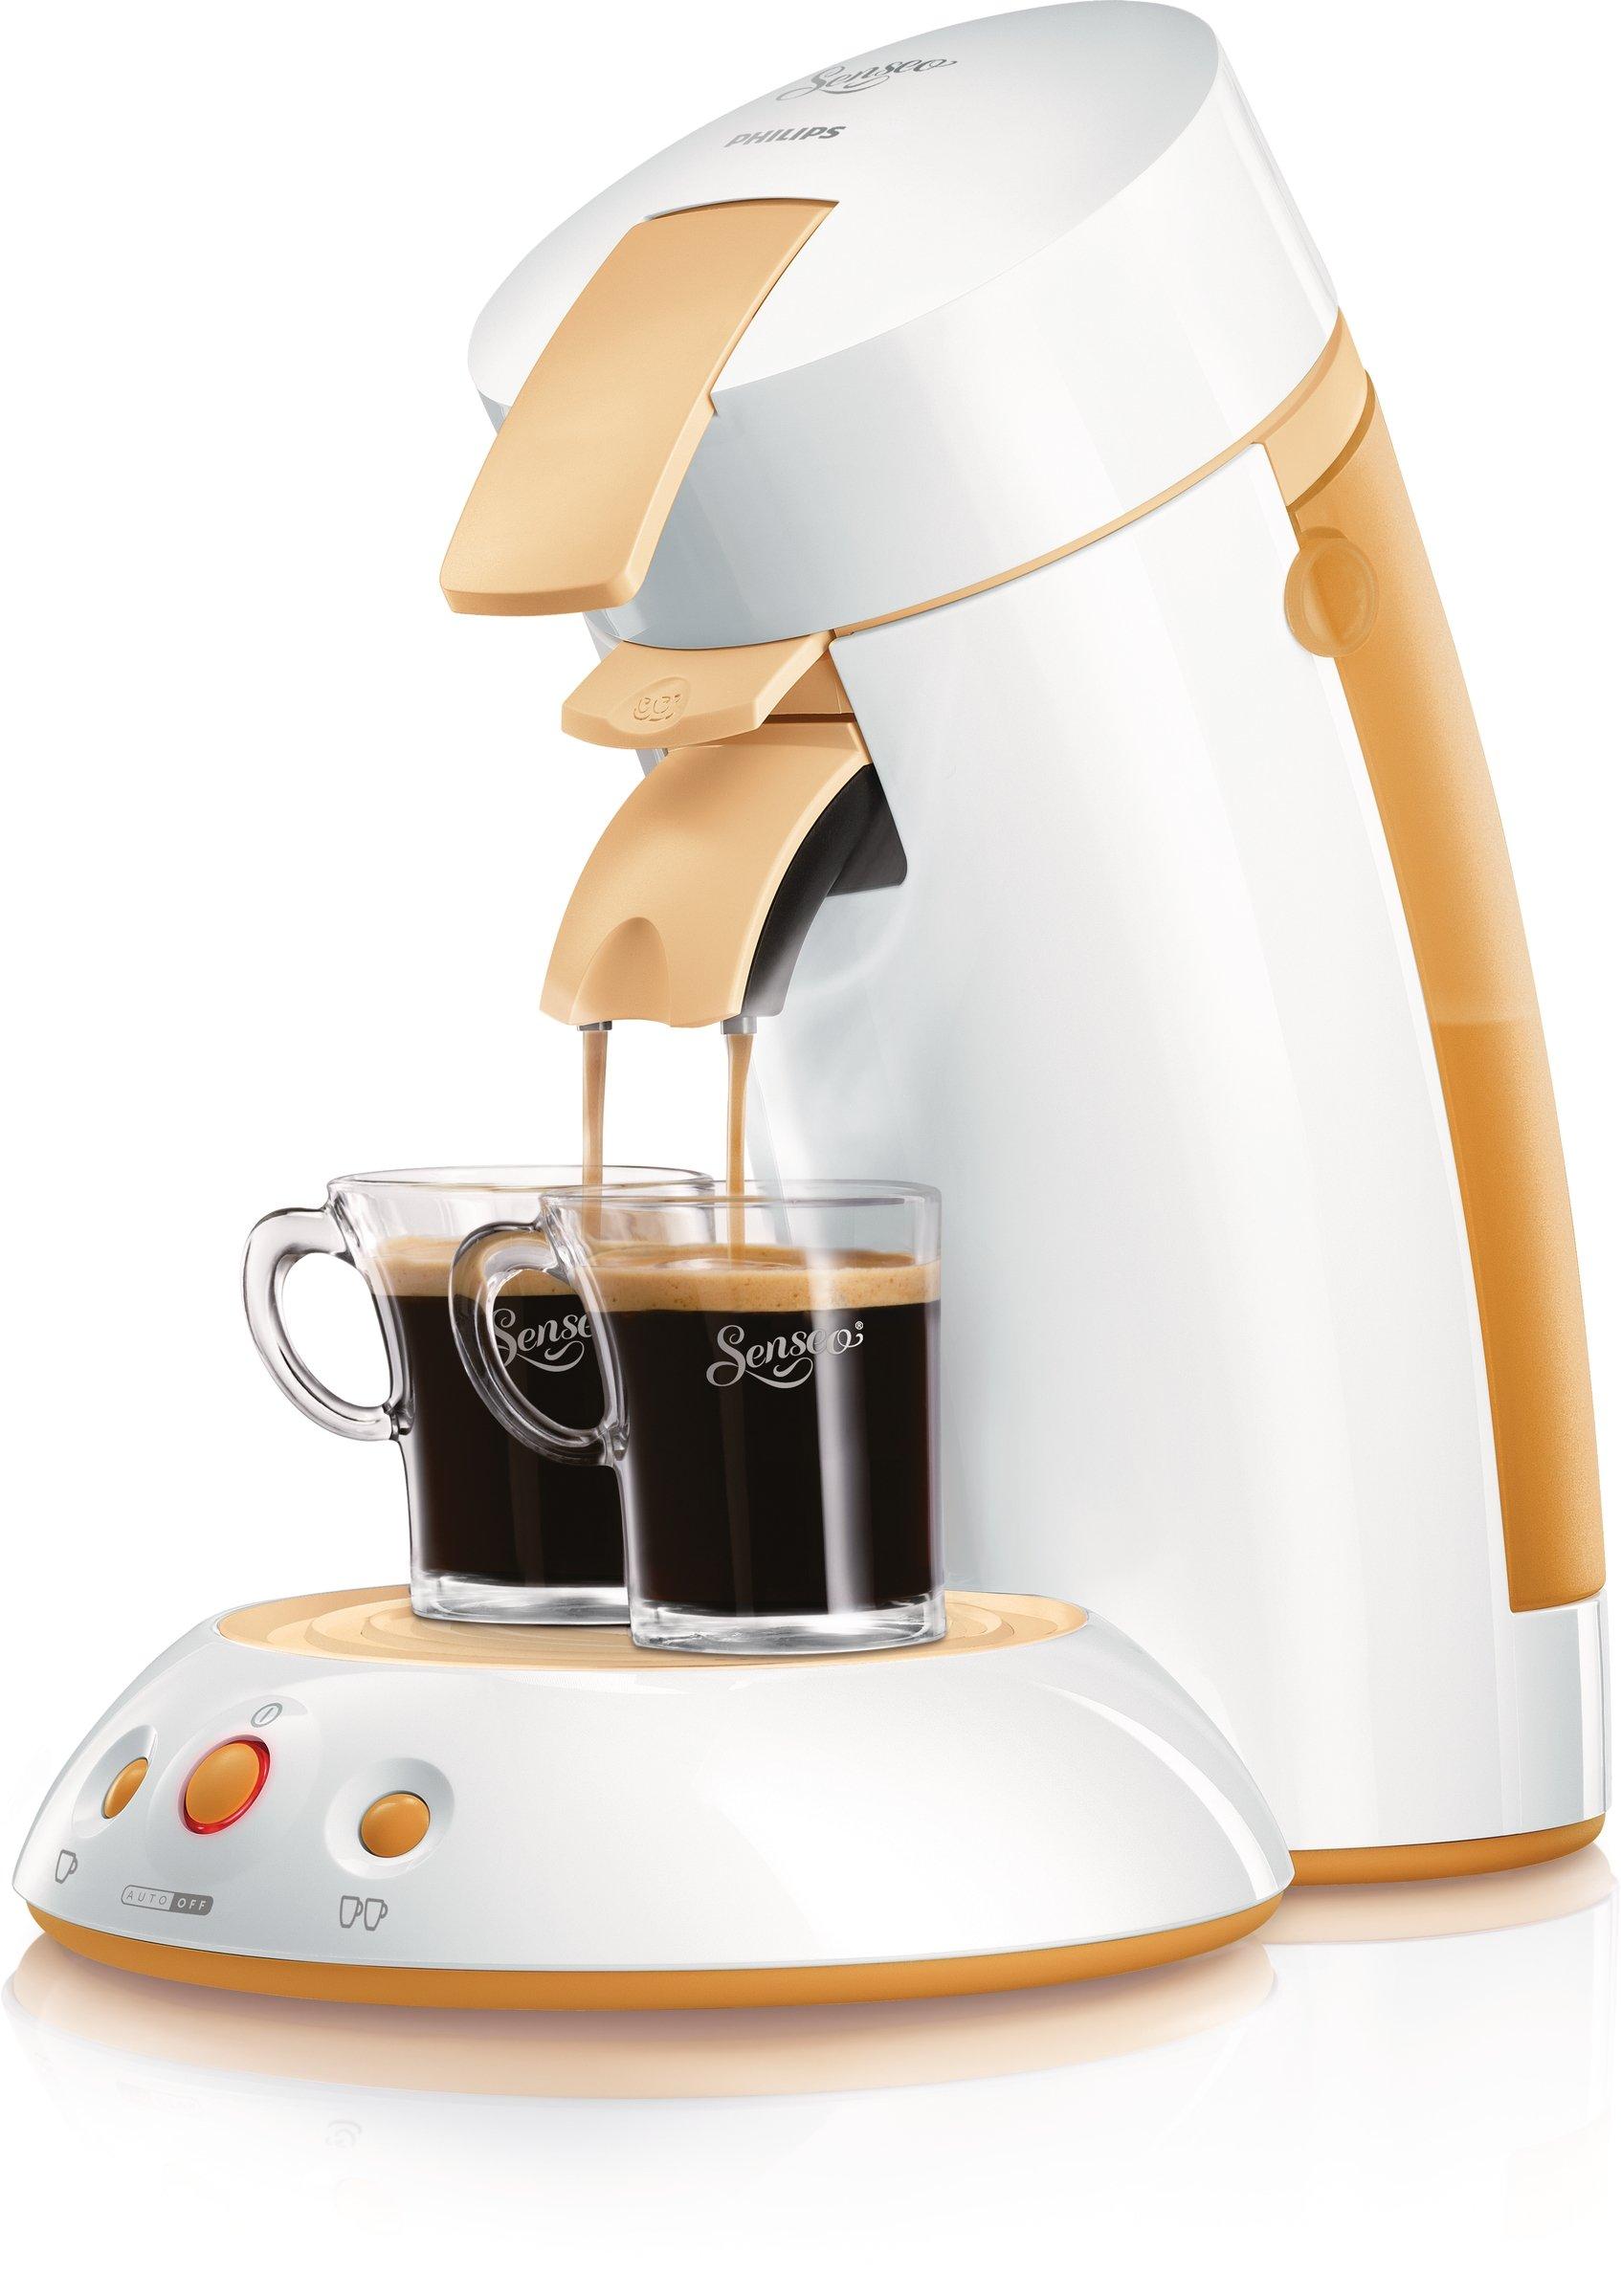 philips hd 7810 55 kaffeeautomat senseo wei orange. Black Bedroom Furniture Sets. Home Design Ideas